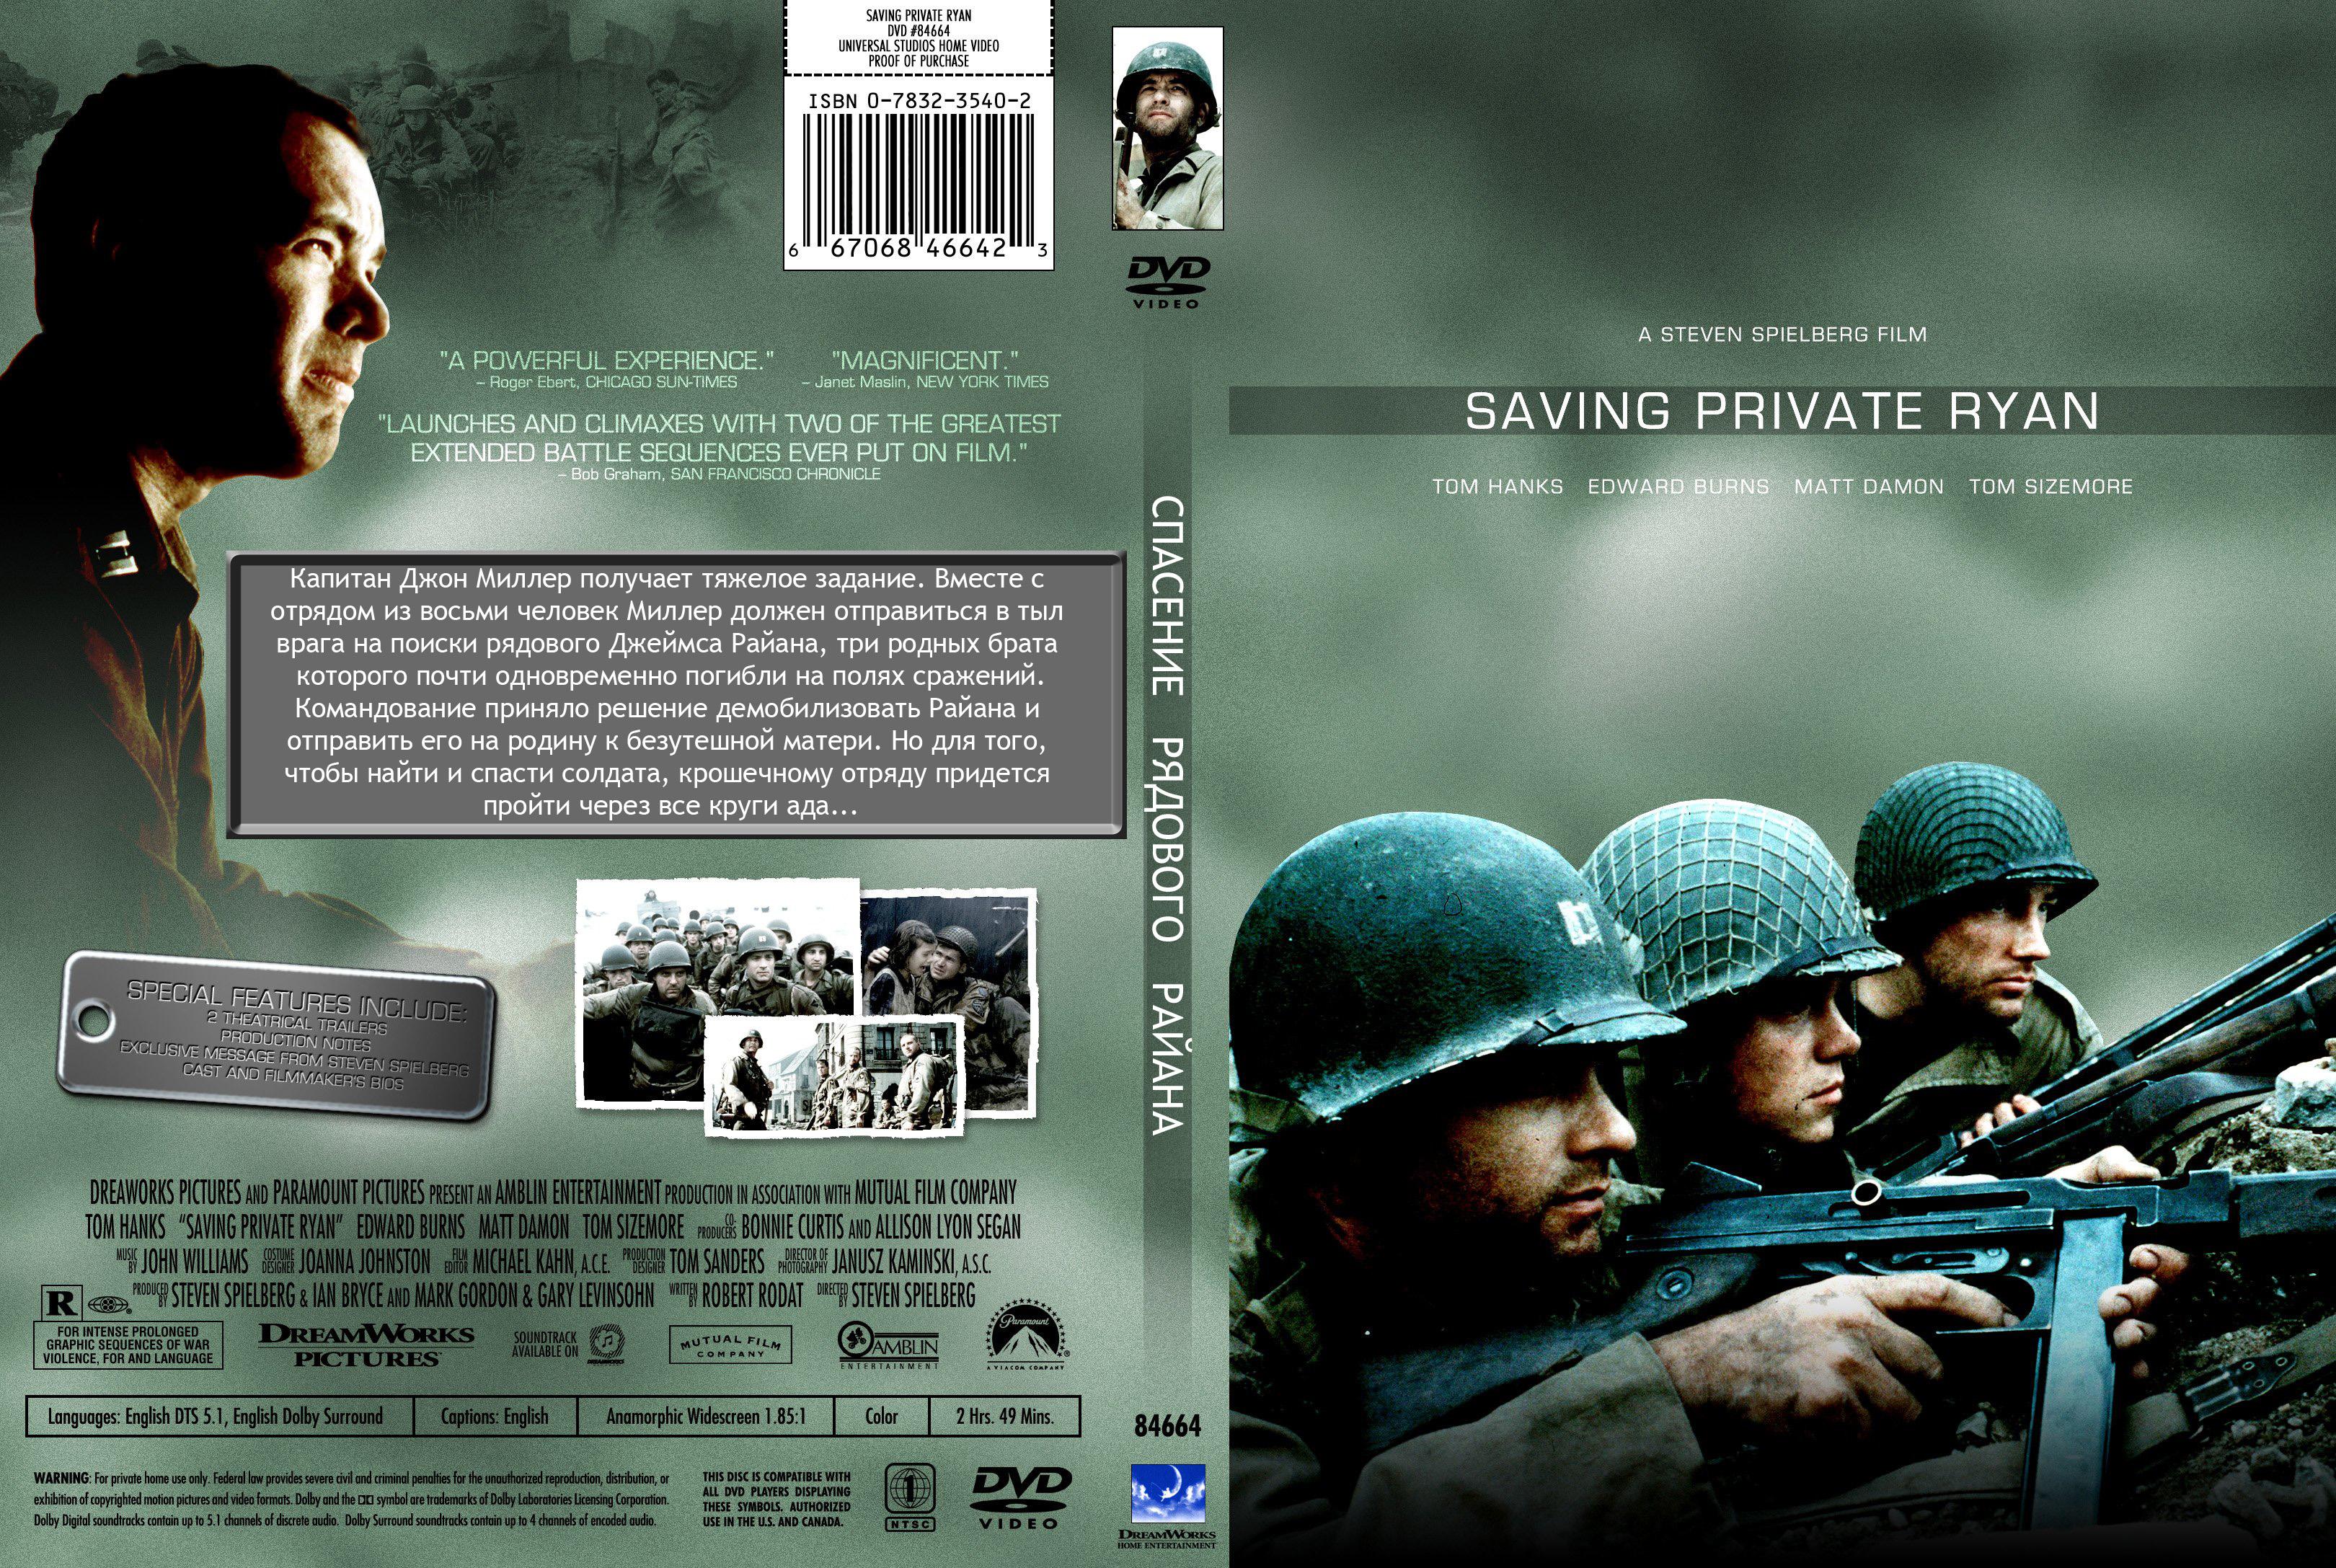 Covers Box Sk Saving Private Ryan 1998 High Quality Dvd Blueray Movie